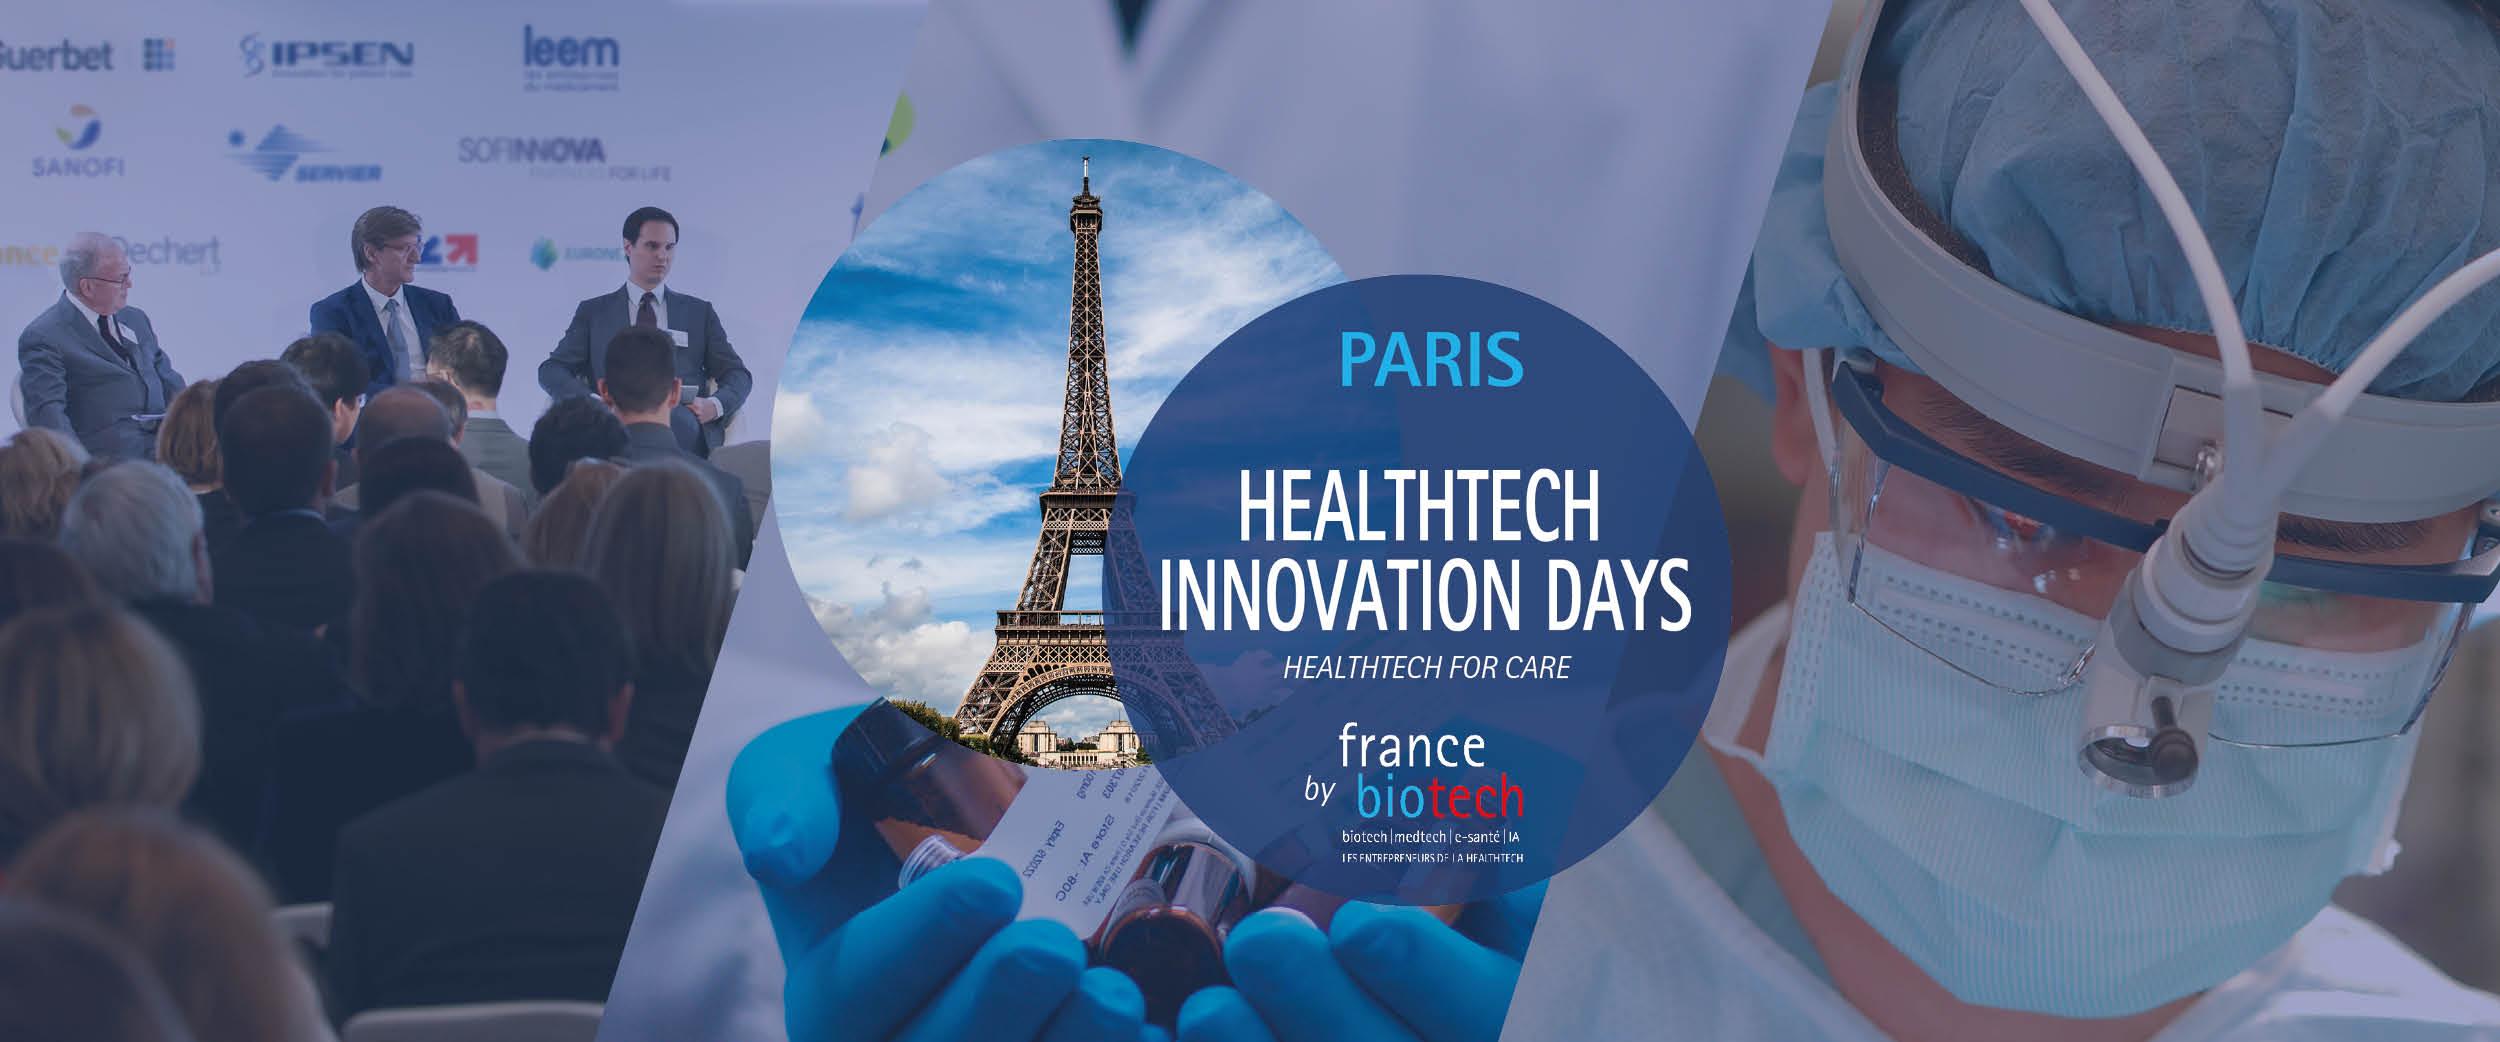 Health Tech Innovation Days